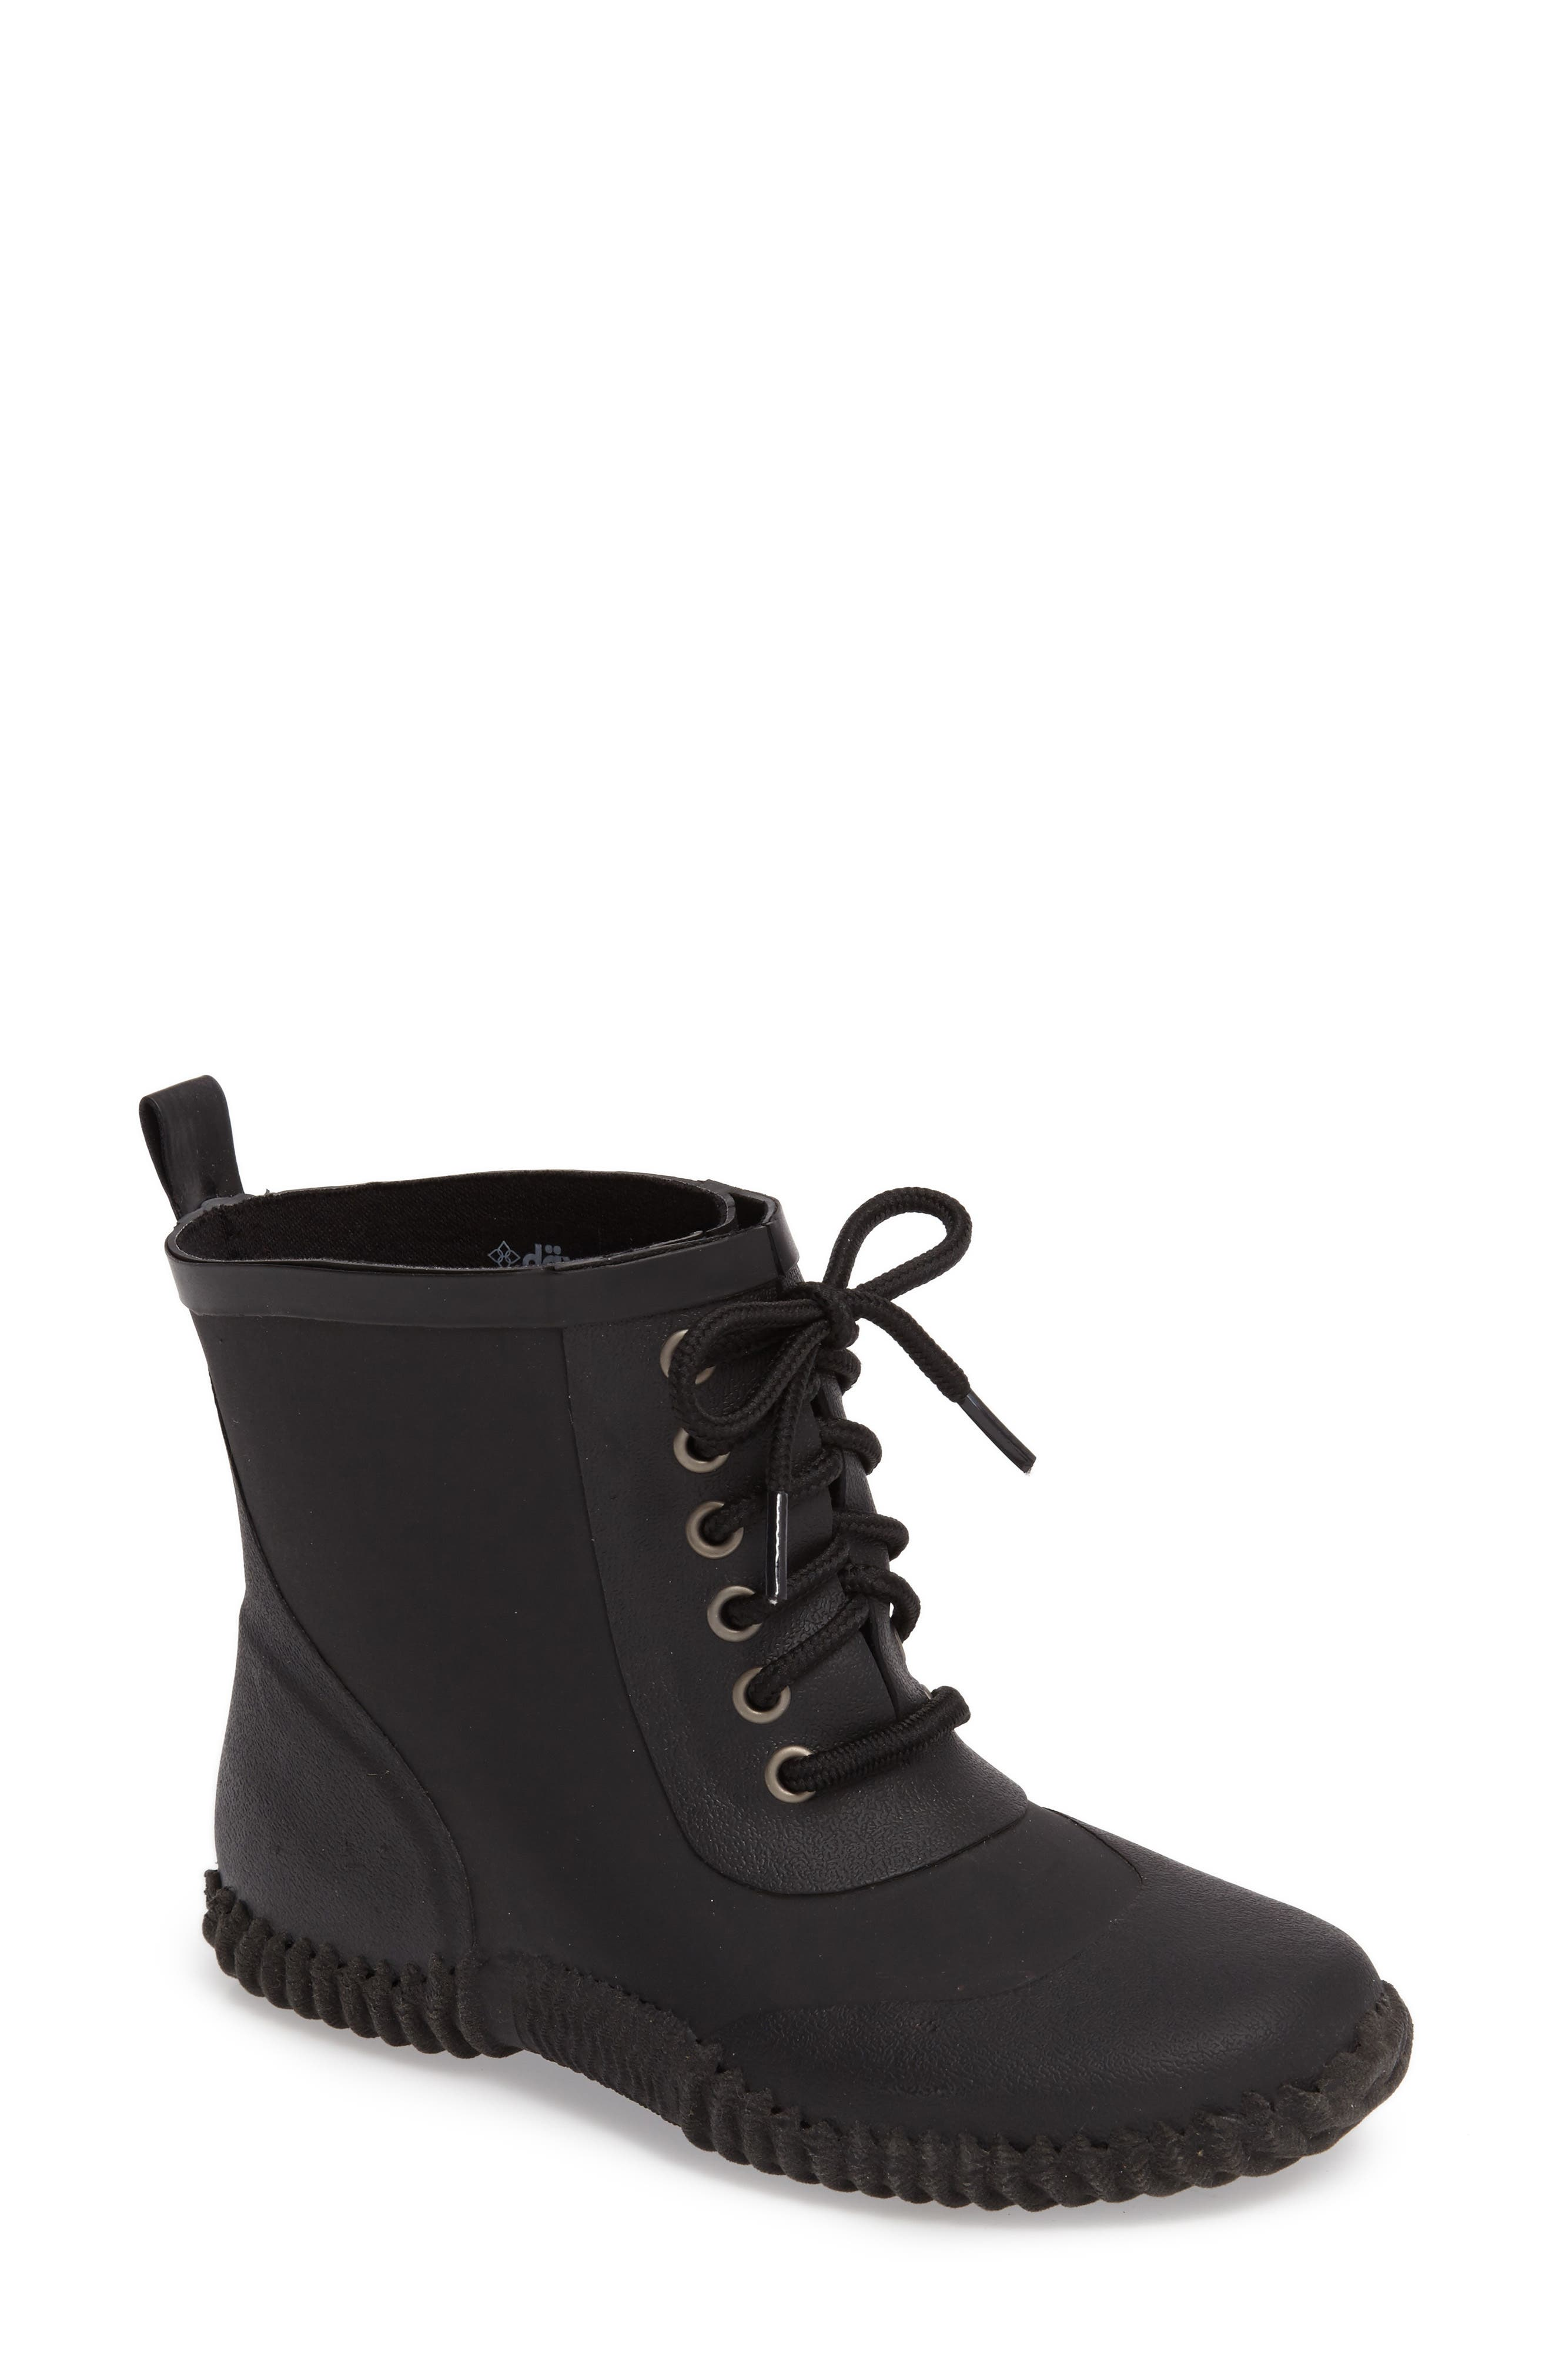 DÄV Telluride Waterproof Rain Boot, Main, color, BLACK